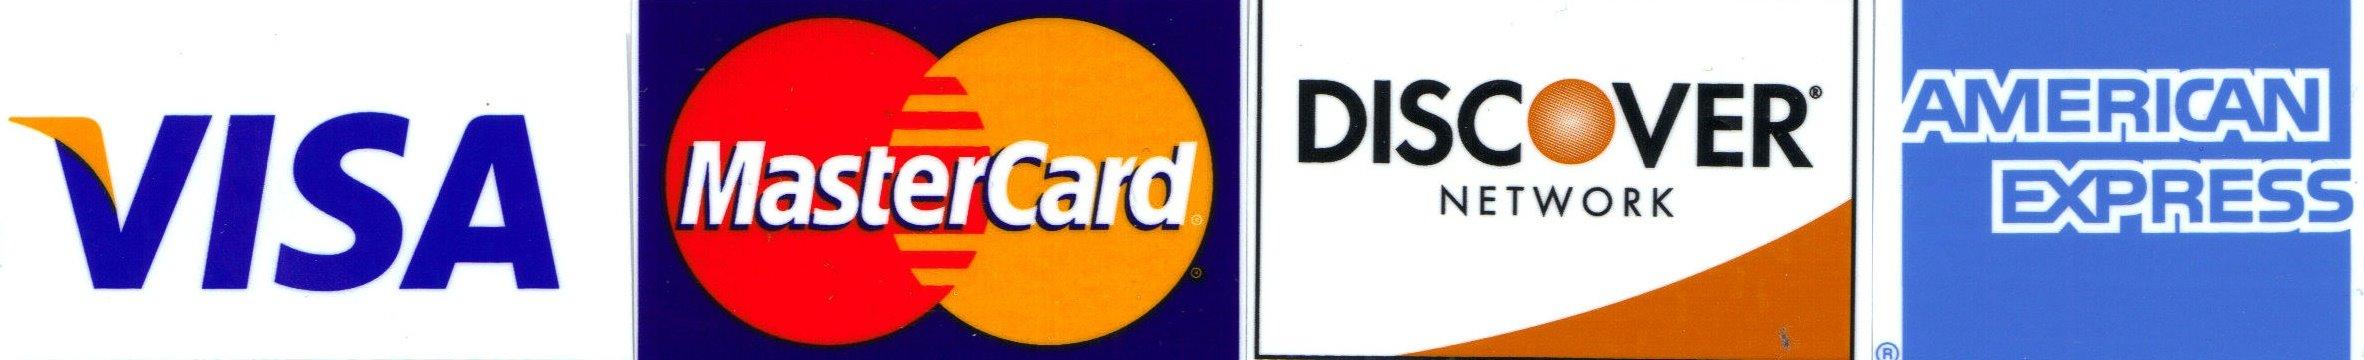 Credit-Card-Logos (1).jpg